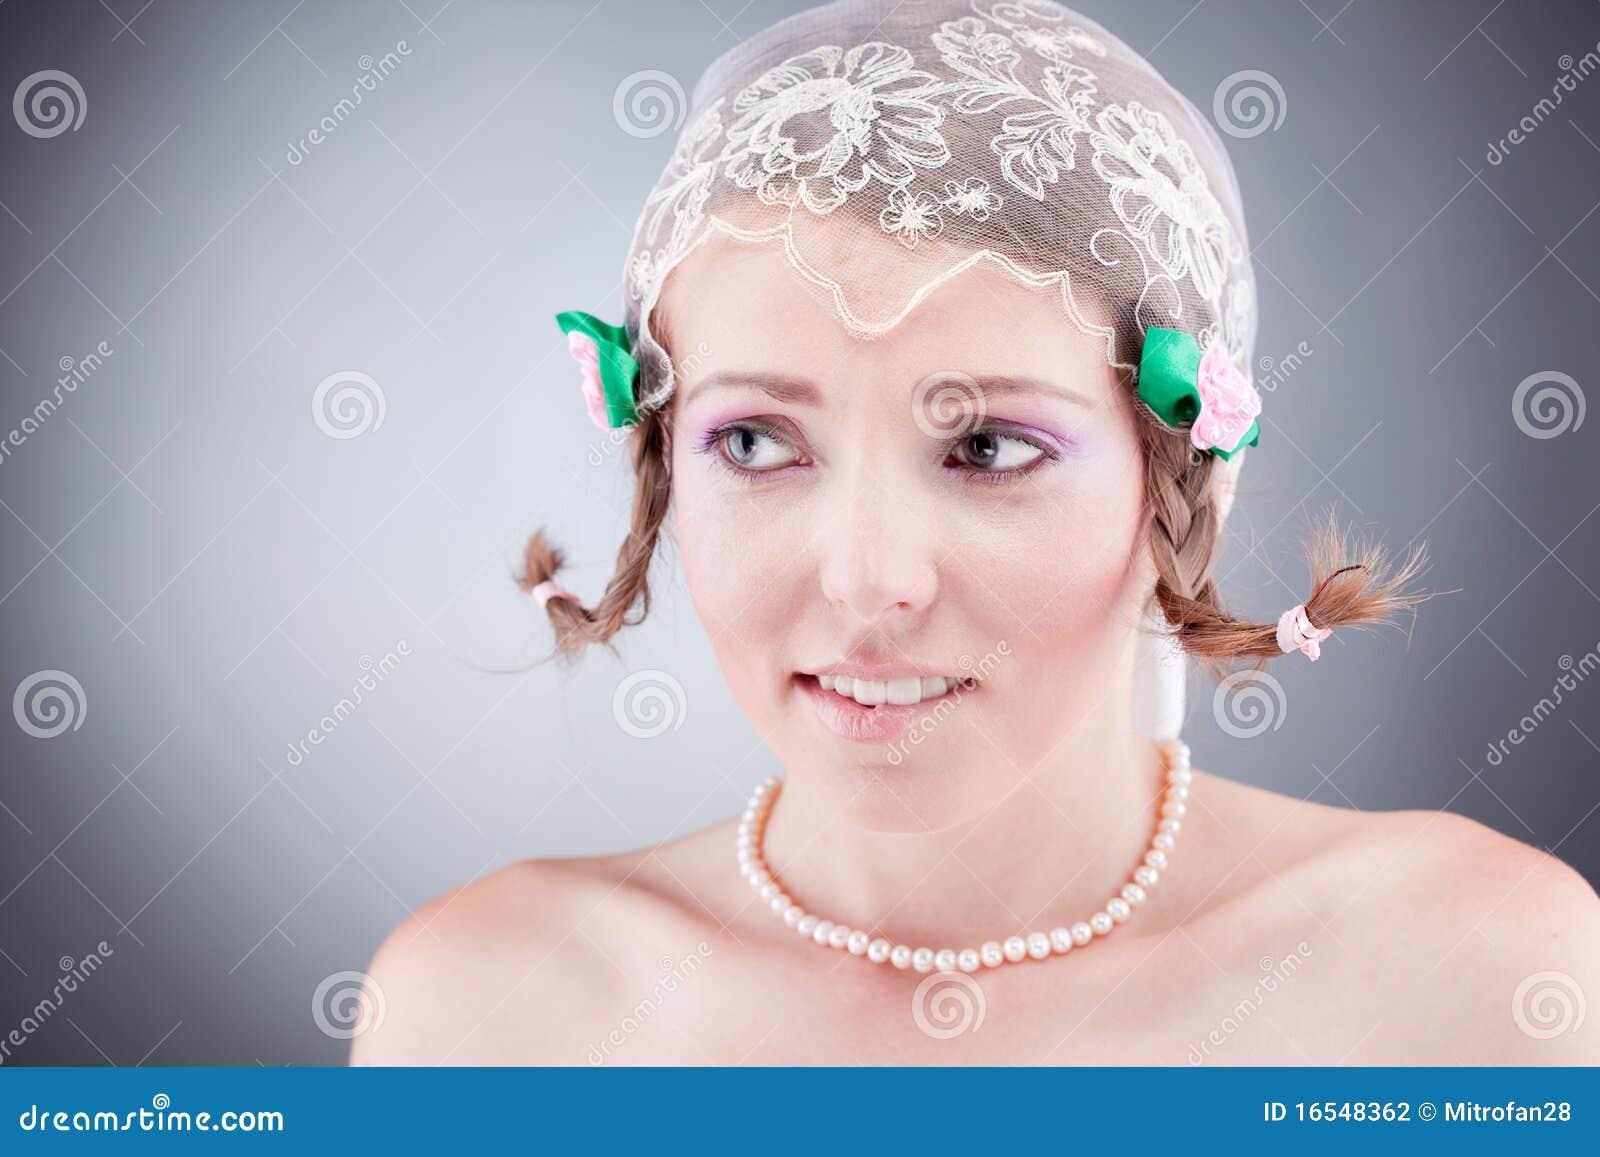 Bad Boy Furniture Kitchener Cute Girl Biting Lip Decicing Cute Young Bride Biting Her